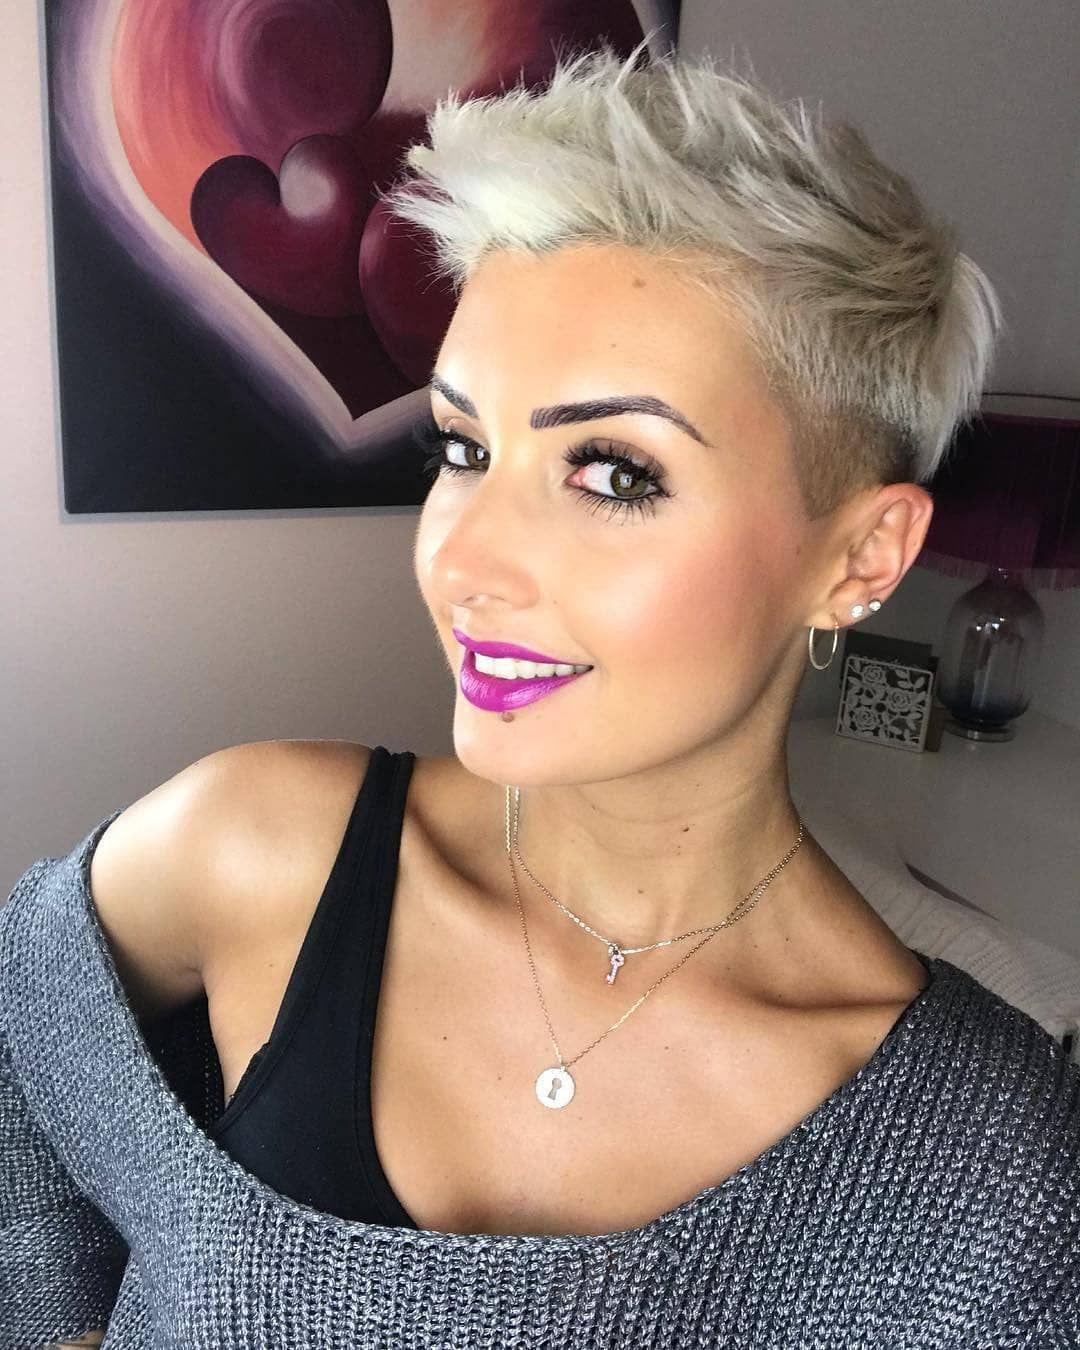 "Kurze Haare | Short Hair Ideas on Instagram: ""@jejojejo87 � ...... #kurzehaare #kurzhaarfrisuren #kurze #haare #kurzhaarschnitt #haarschnitt #frisuren #kurzhaarfrisur #frisuridee…"""